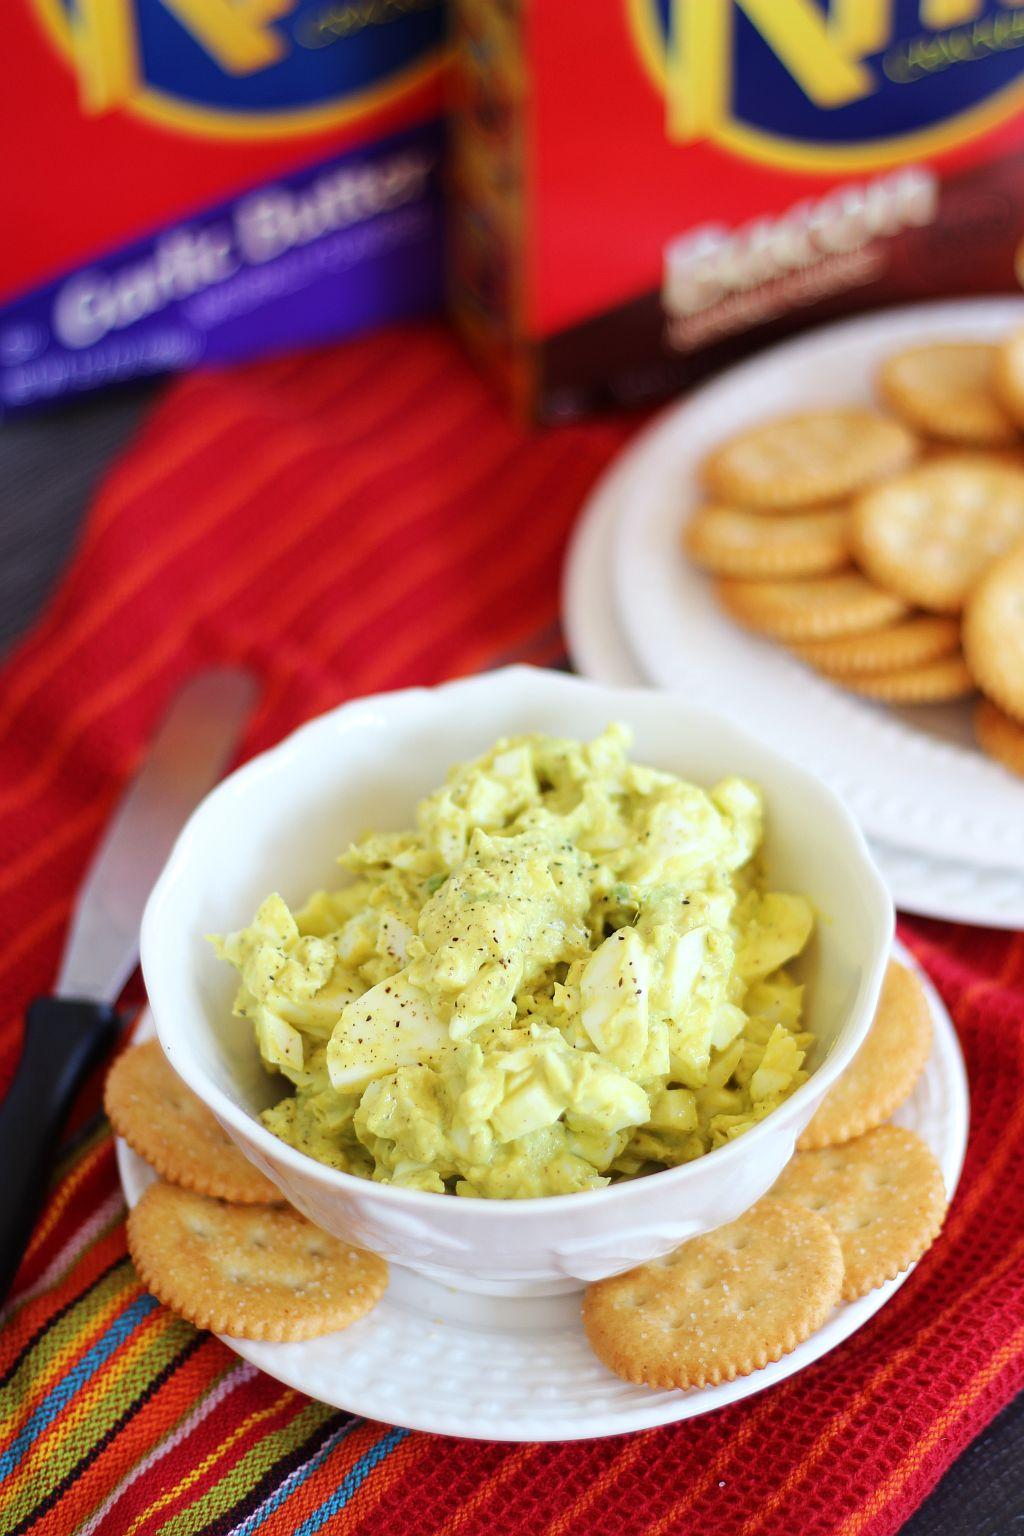 Avocado Egg Salad on Crackers